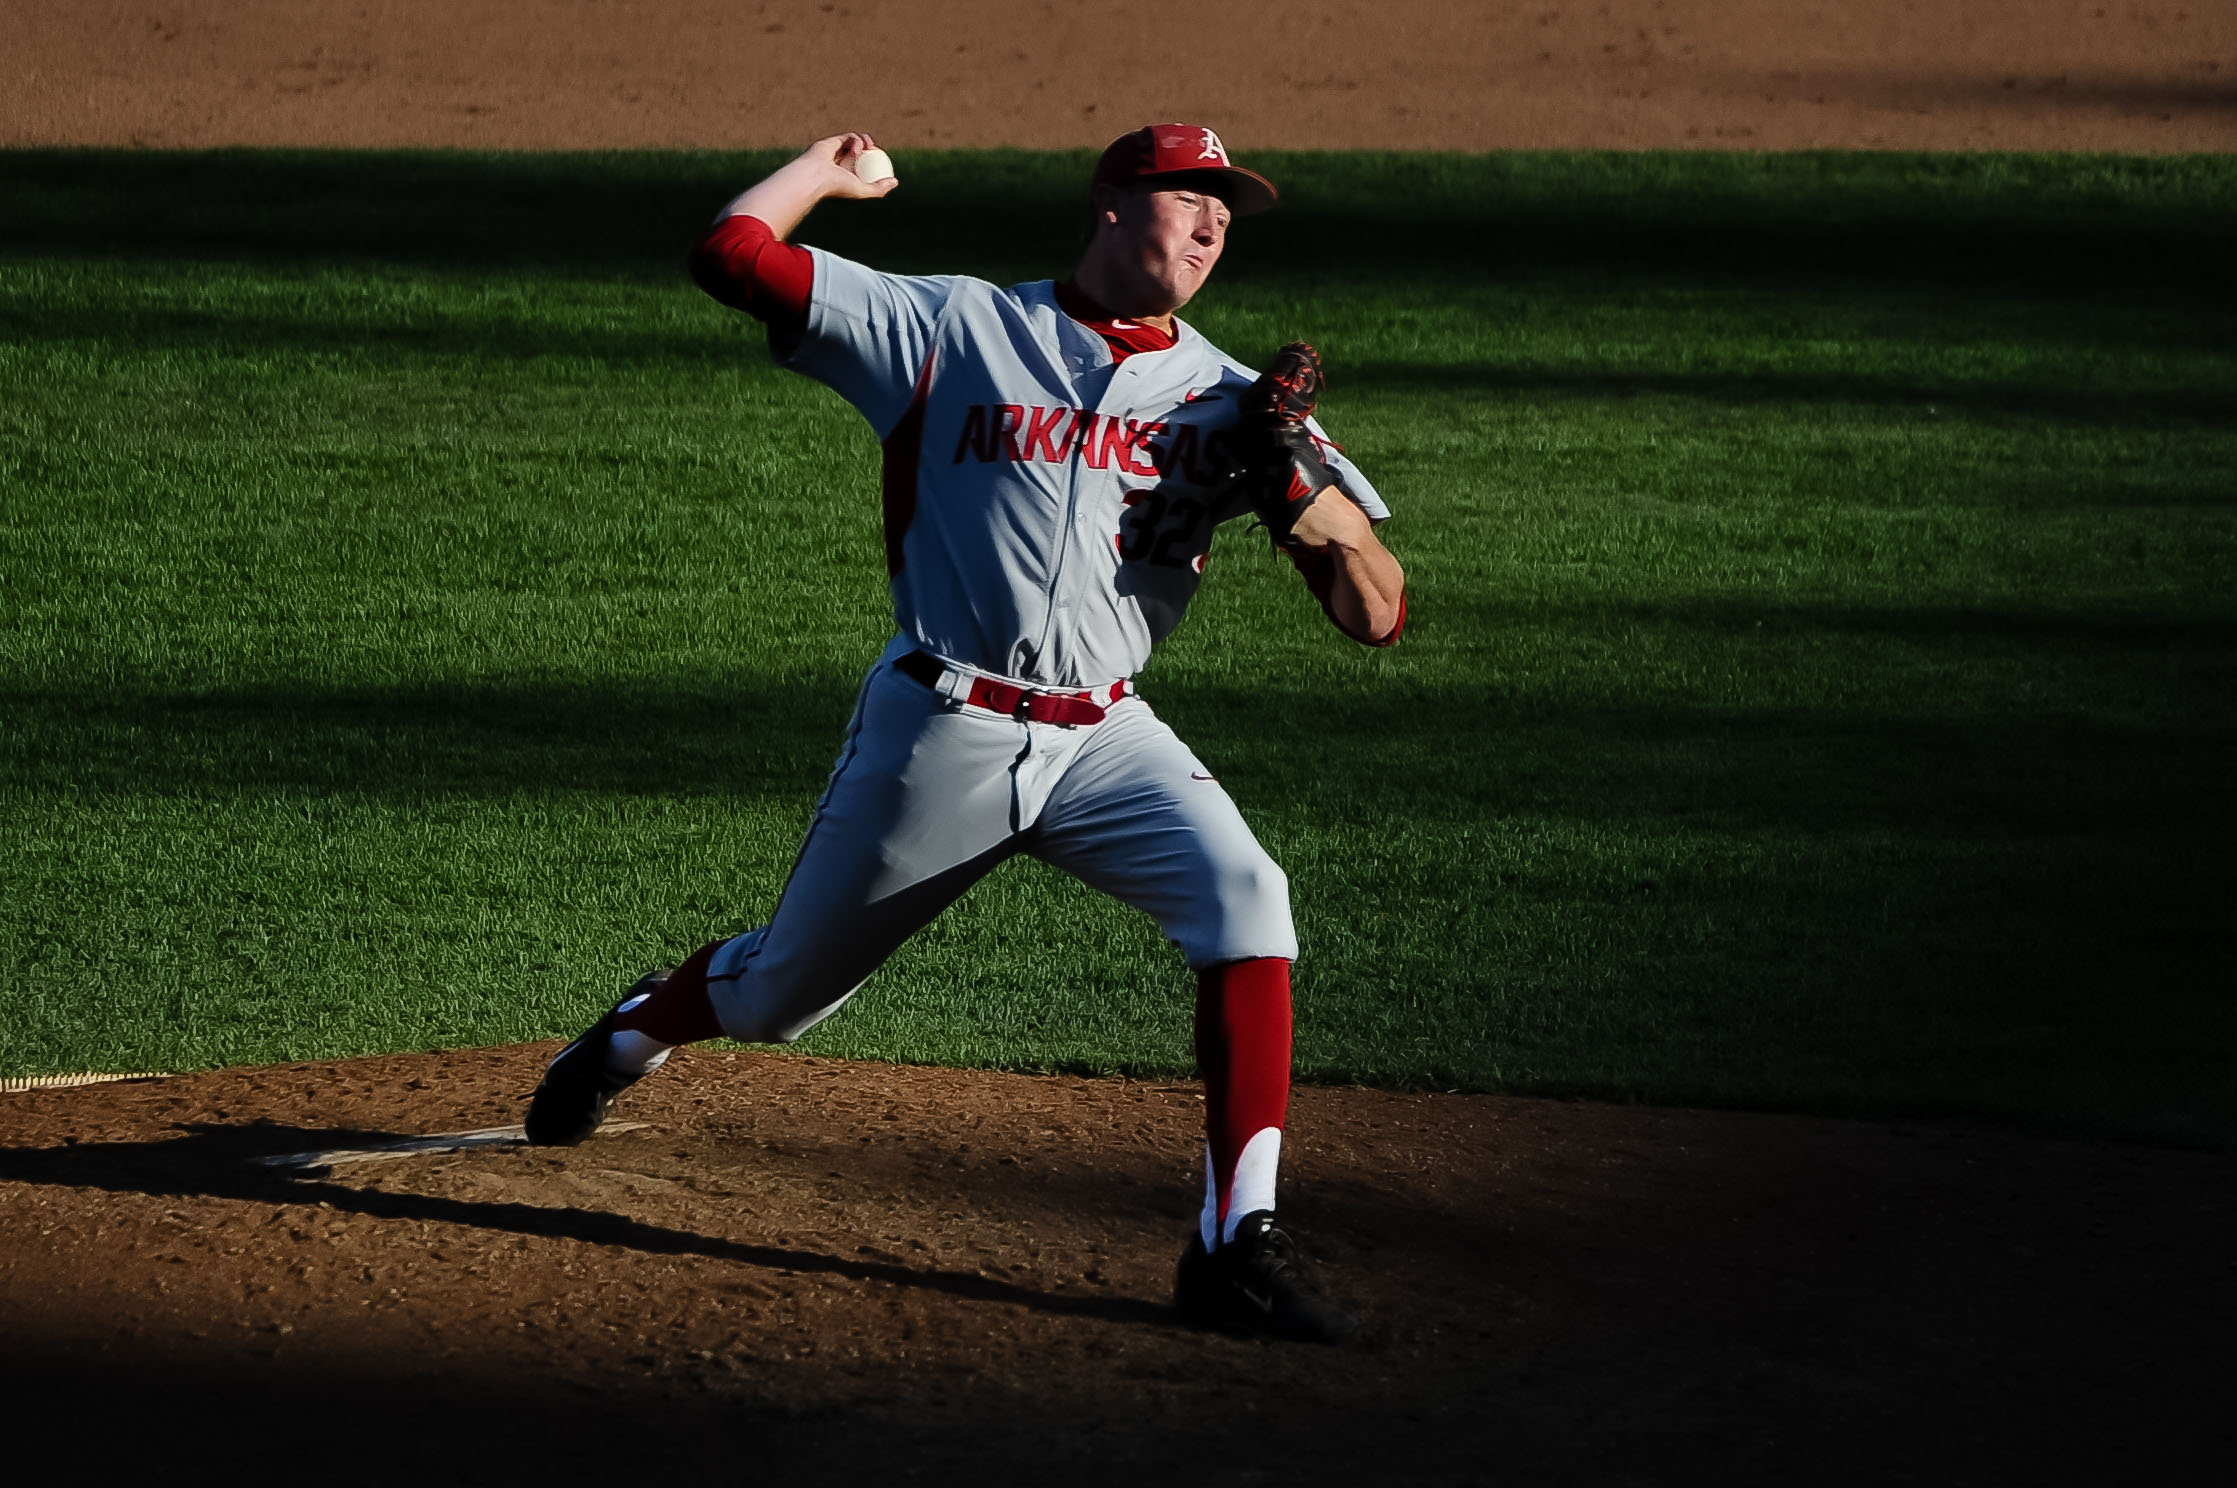 8629862-ncaa-baseball-college-world-series-arkansas-vs-miami